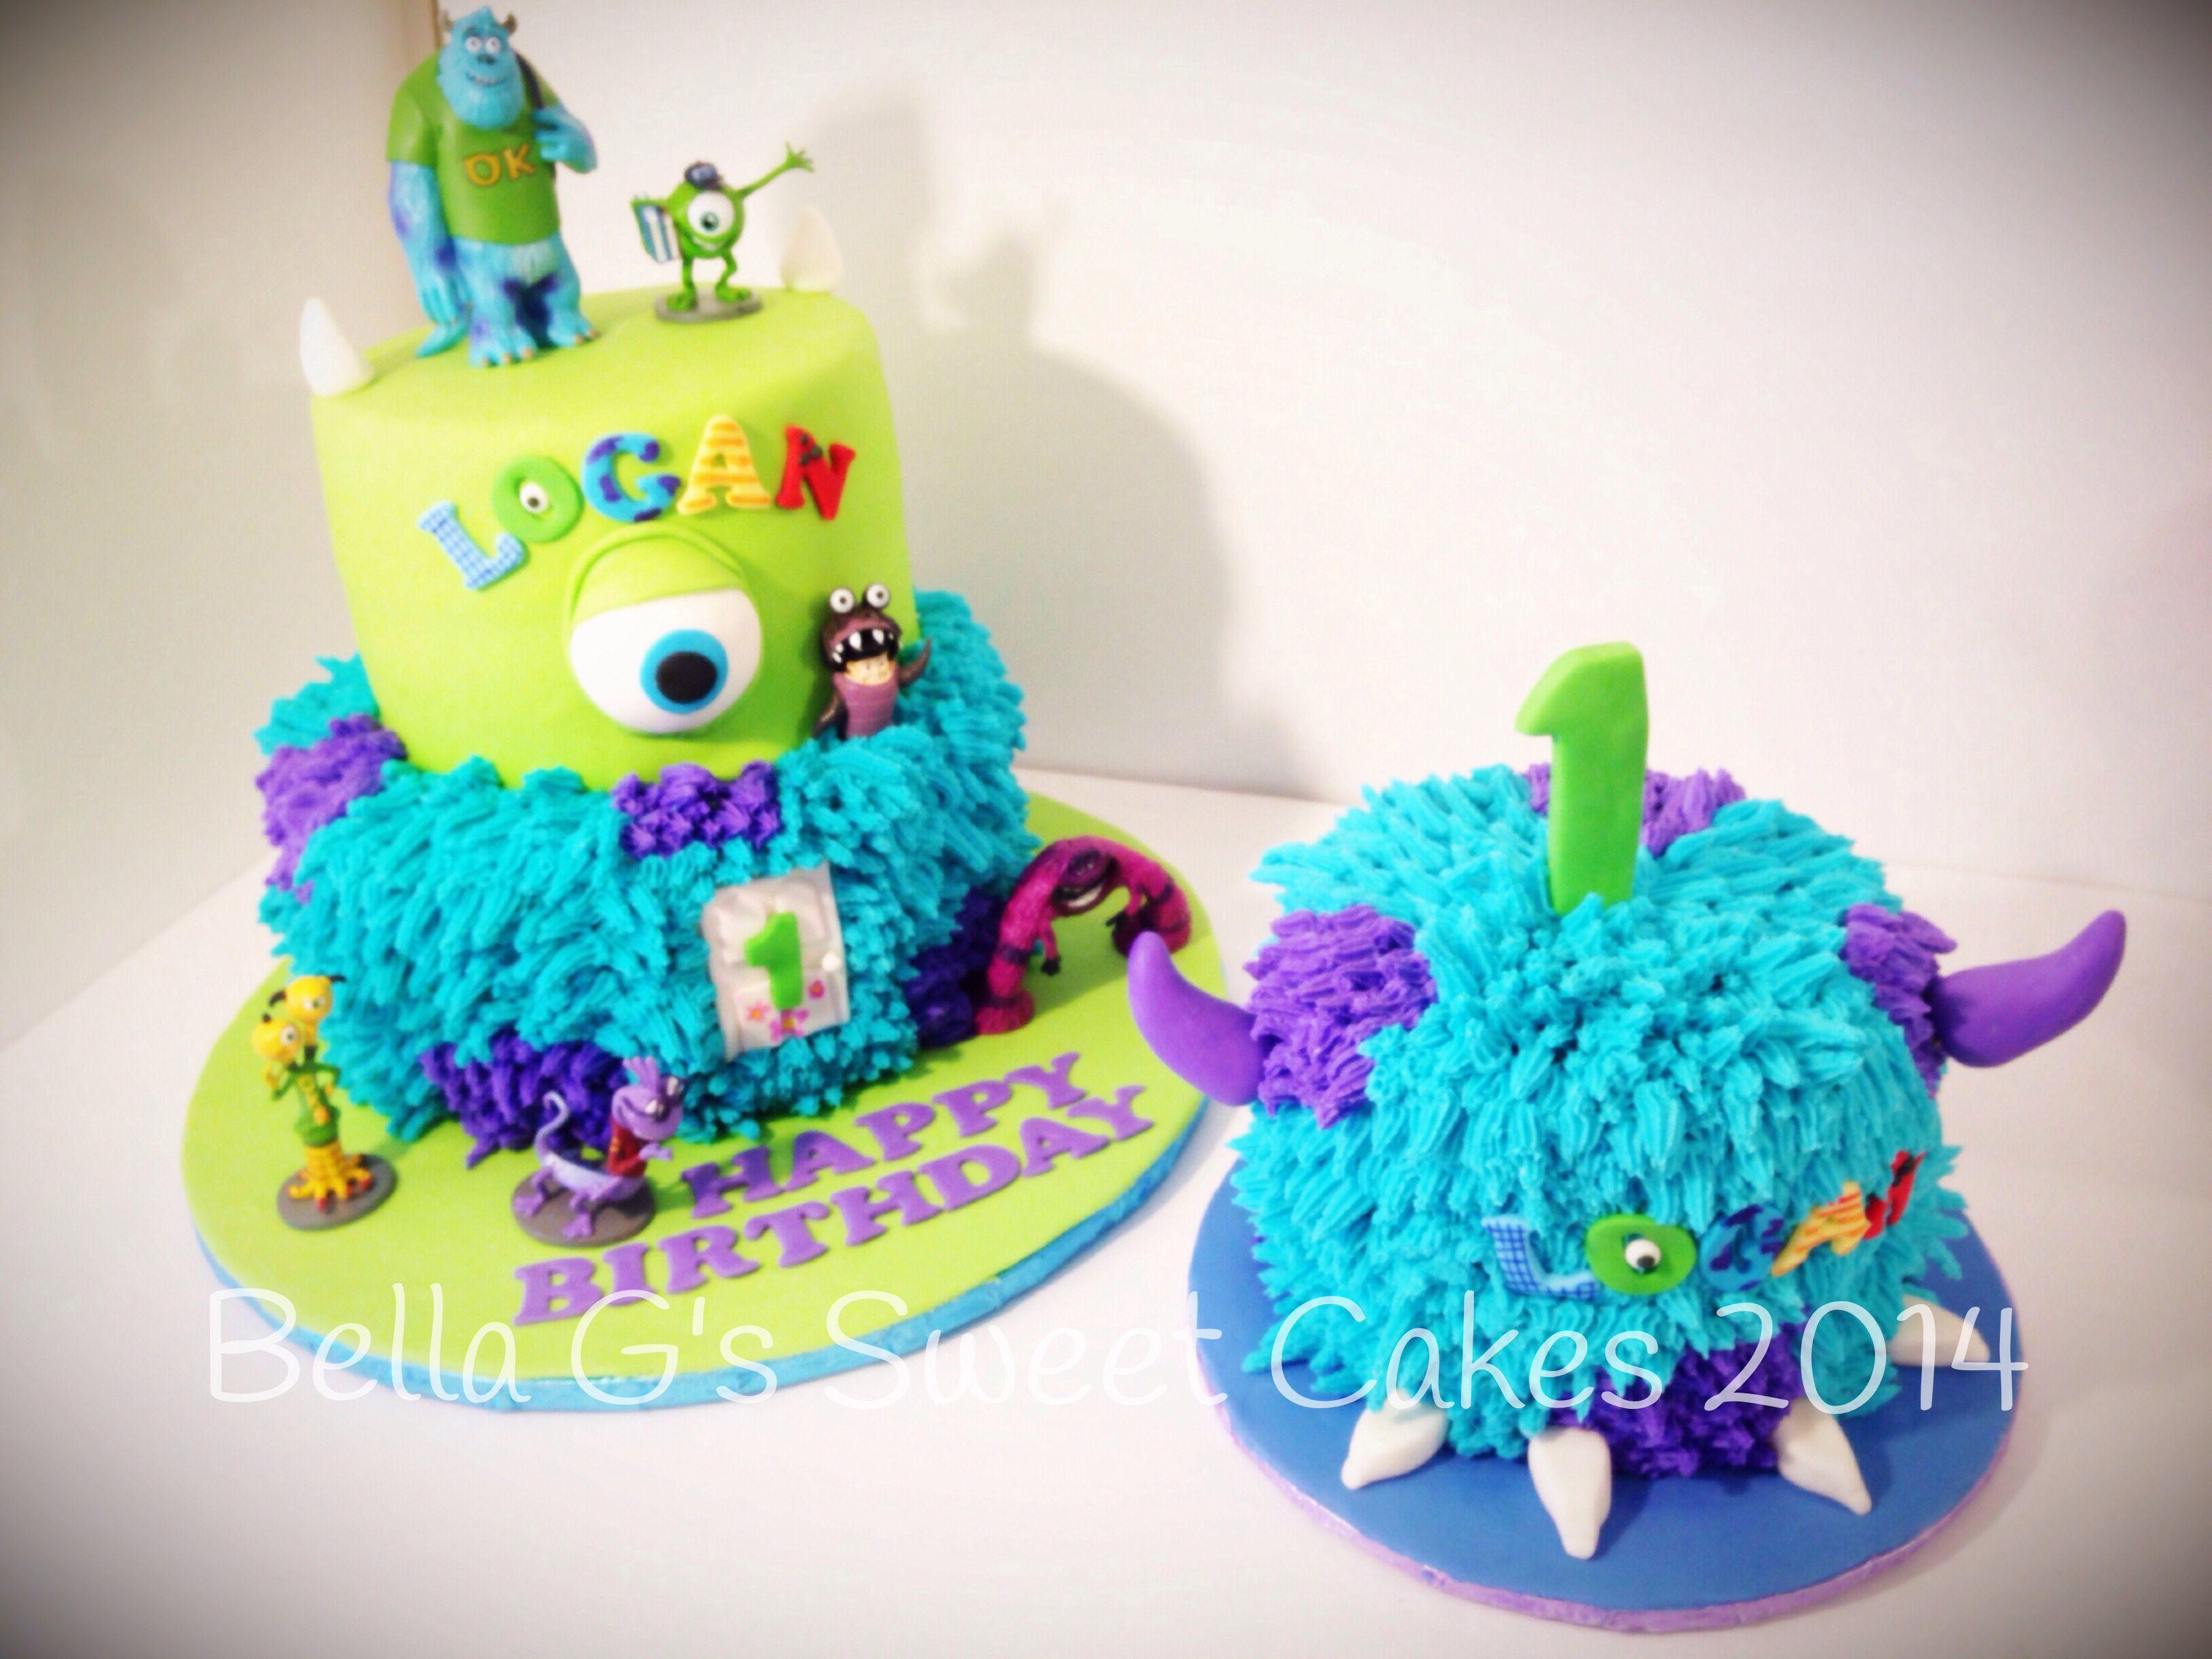 Astounding Monsters Inc Cake And Smash Cake Cupcake Cakes Cake Smash Cake Personalised Birthday Cards Epsylily Jamesorg